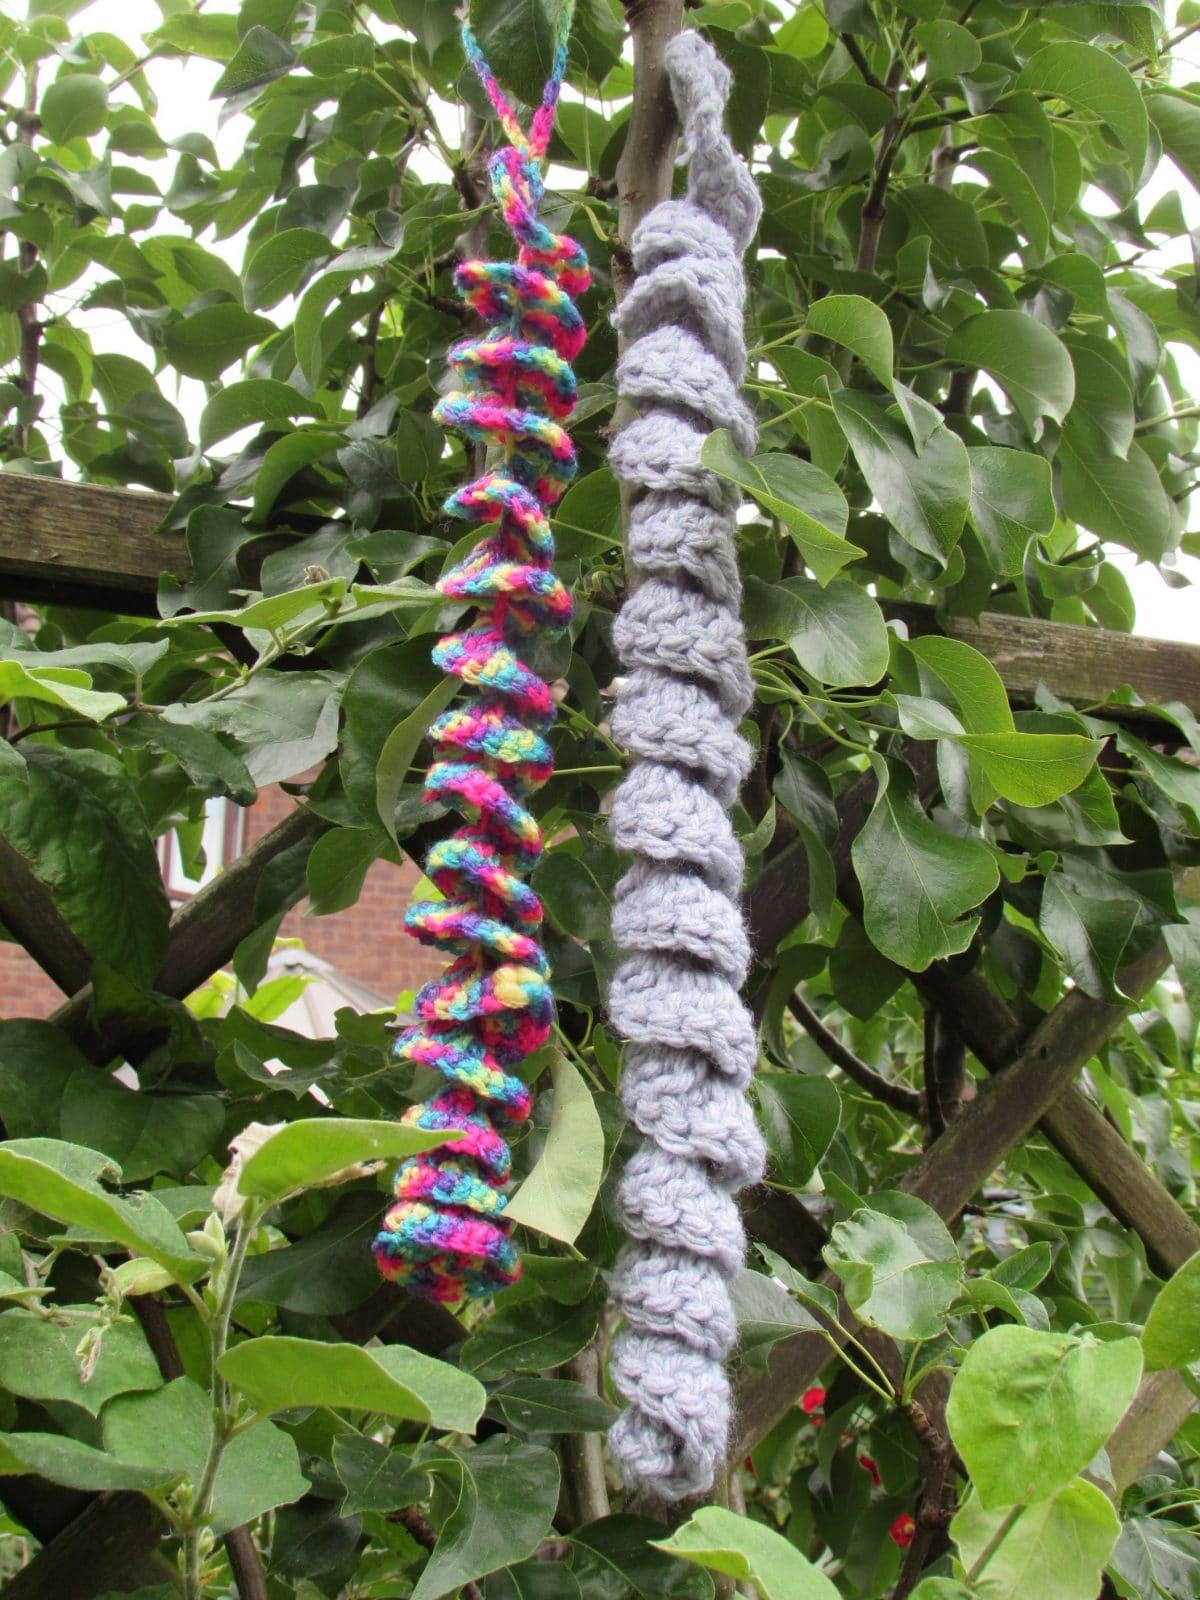 Swindon Stitch & Bitch & The Longest Knit